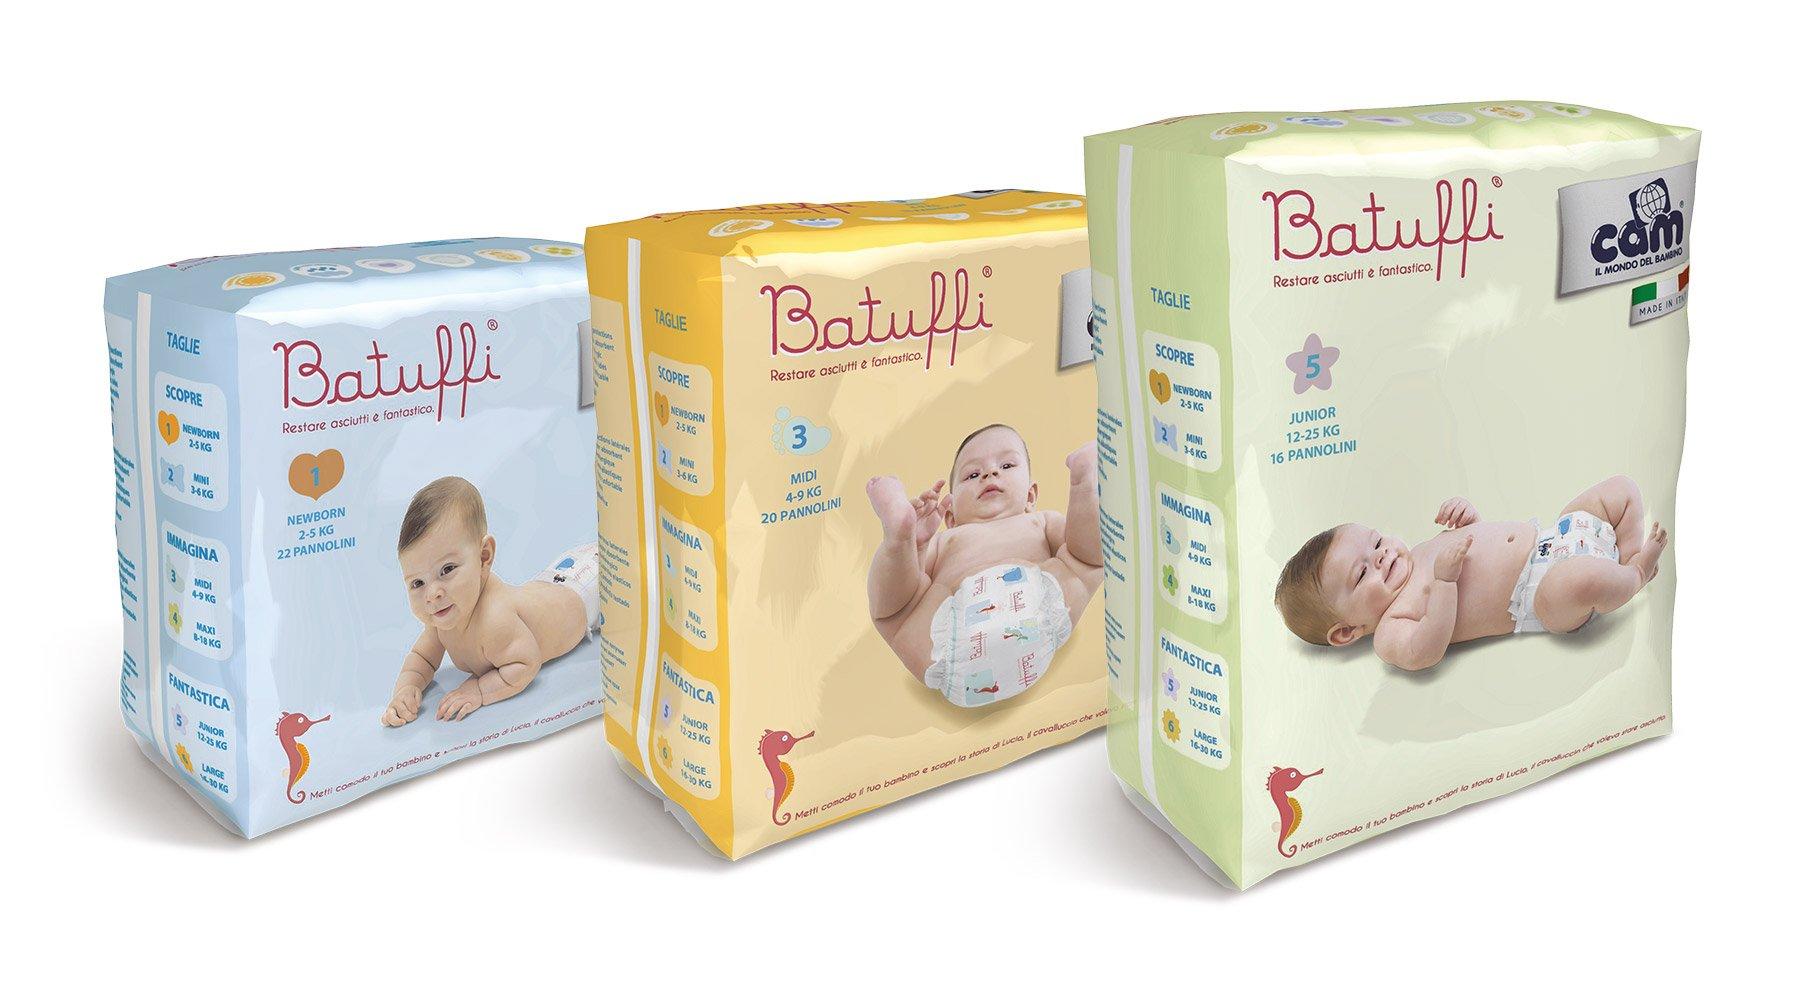 Pannolini per neonati di diverse età